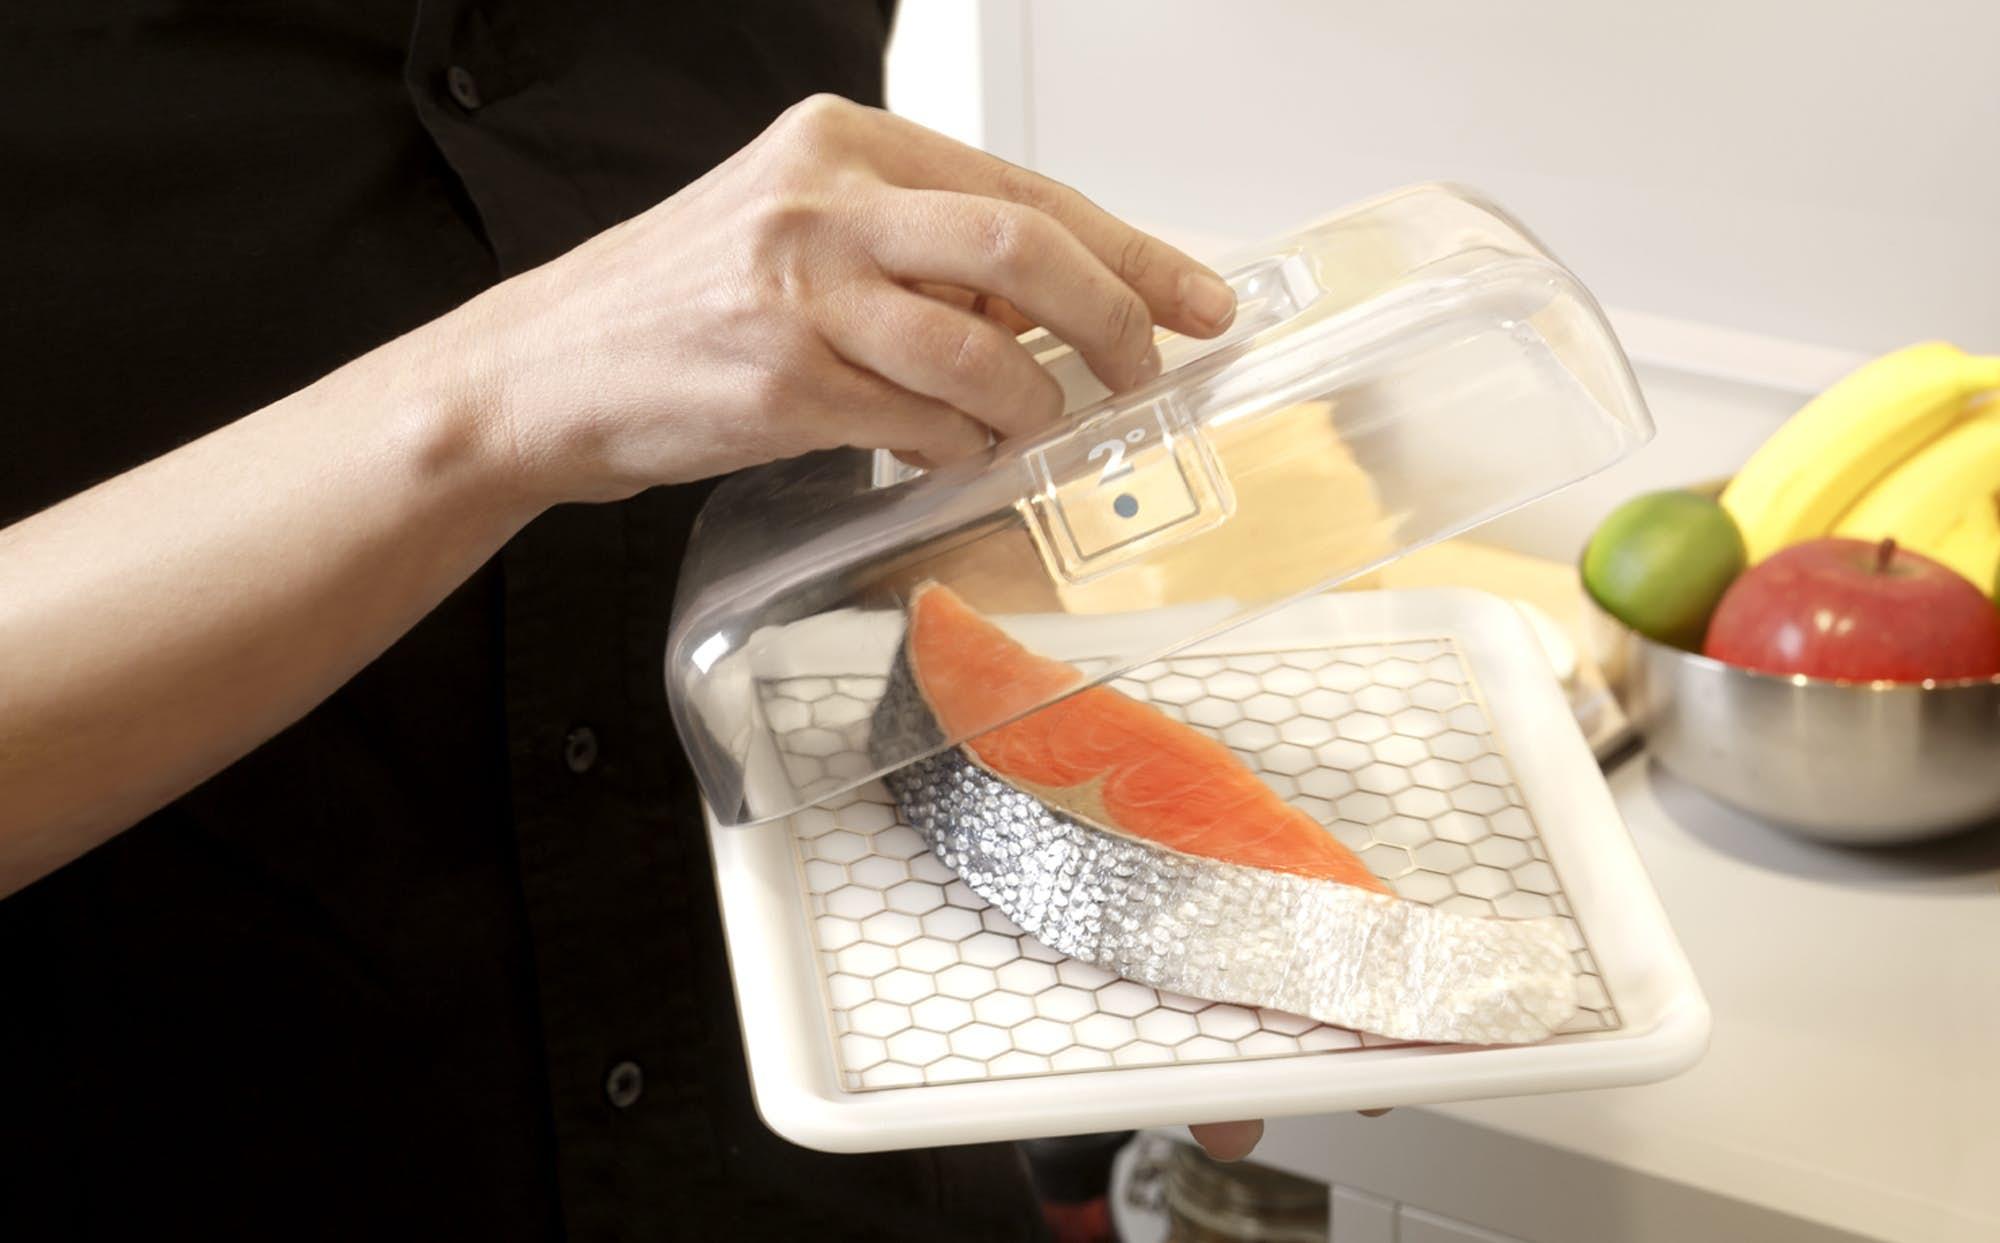 Ikea concept kitchen 2025 reveals how future 39 s kitchen for Concept ikea